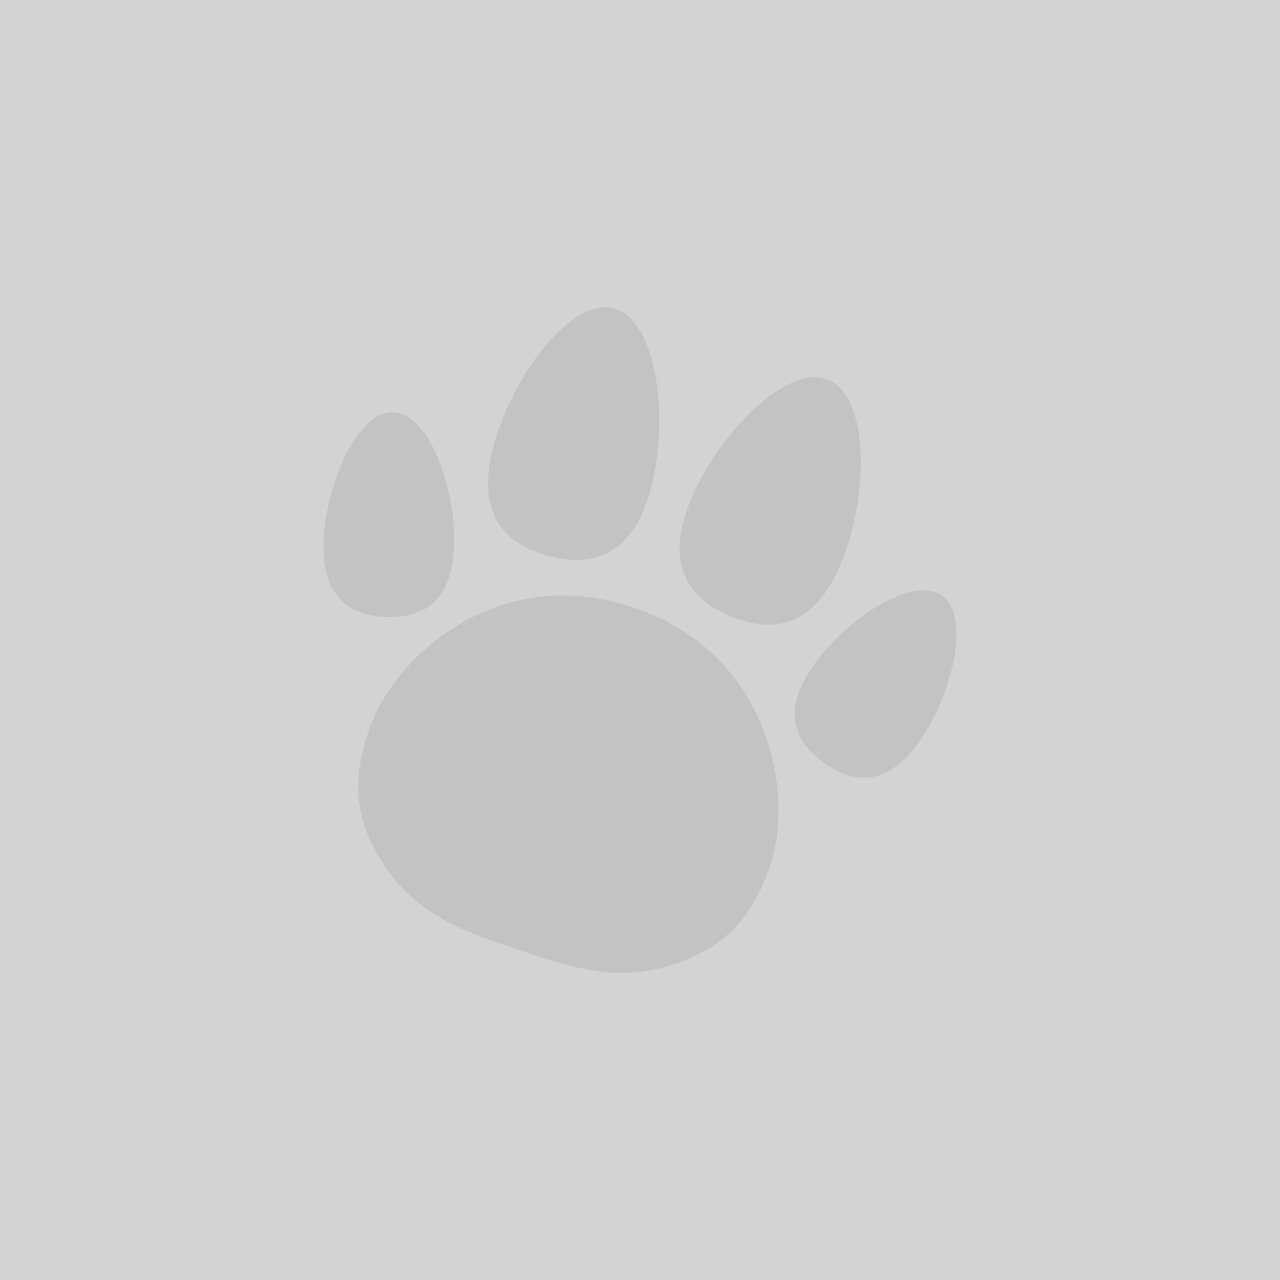 Danish Design Hi Viz 2 in 1 Dog Coat (11 Size Options)